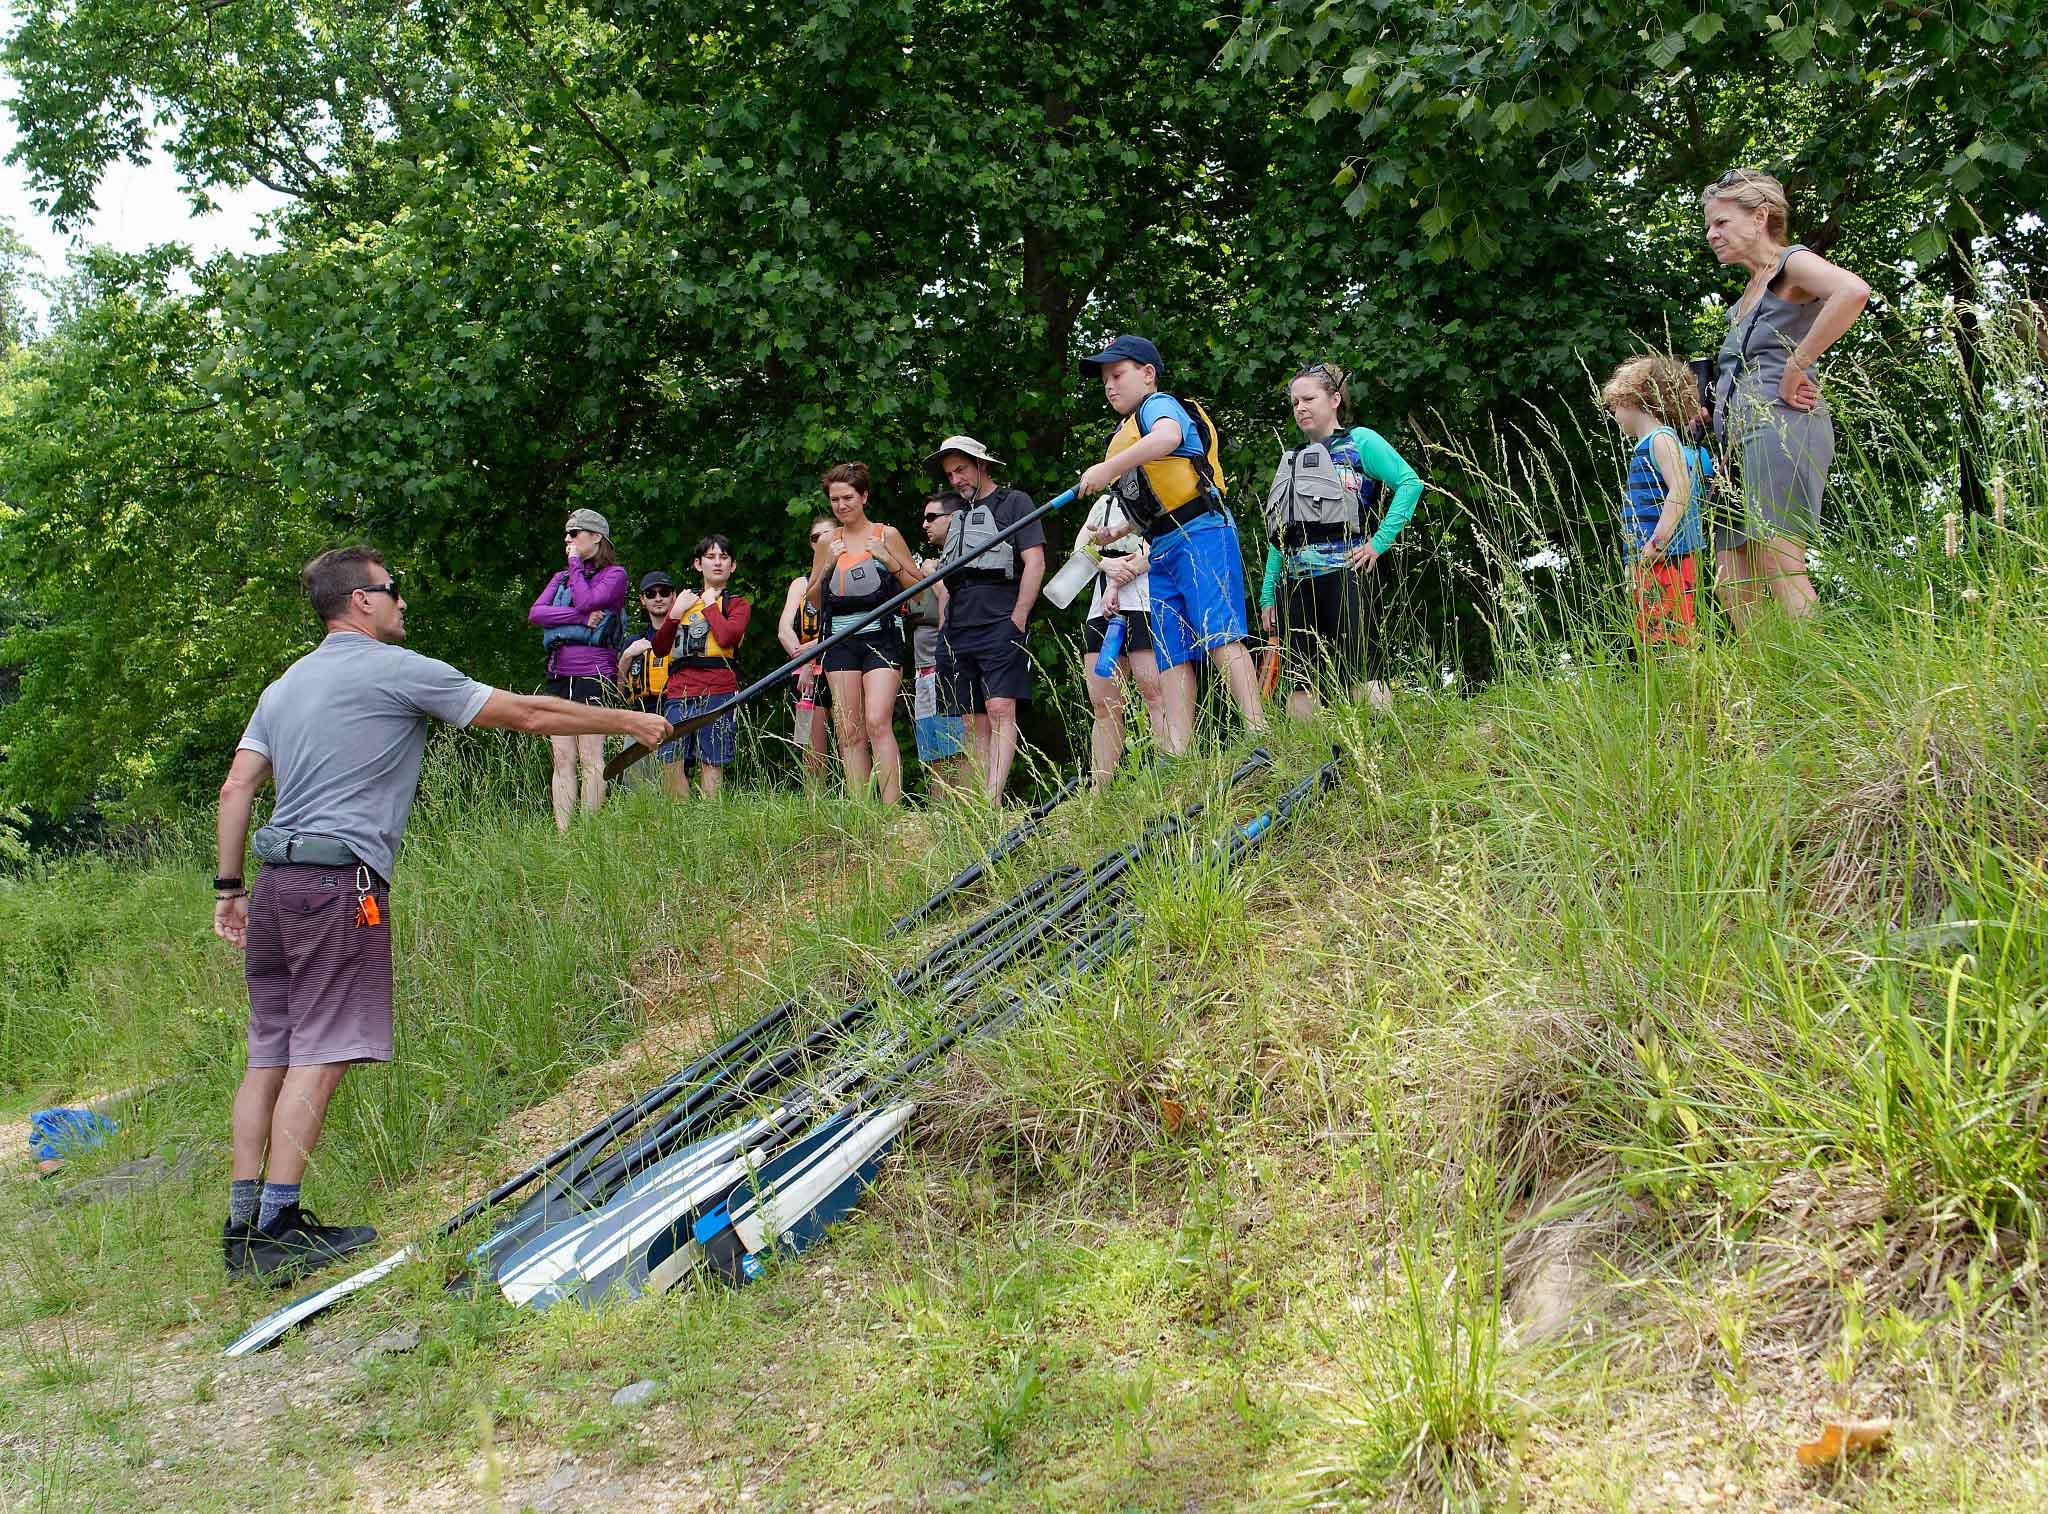 Paddlestroke SUP 1 Lesson handing paddle to new paddler